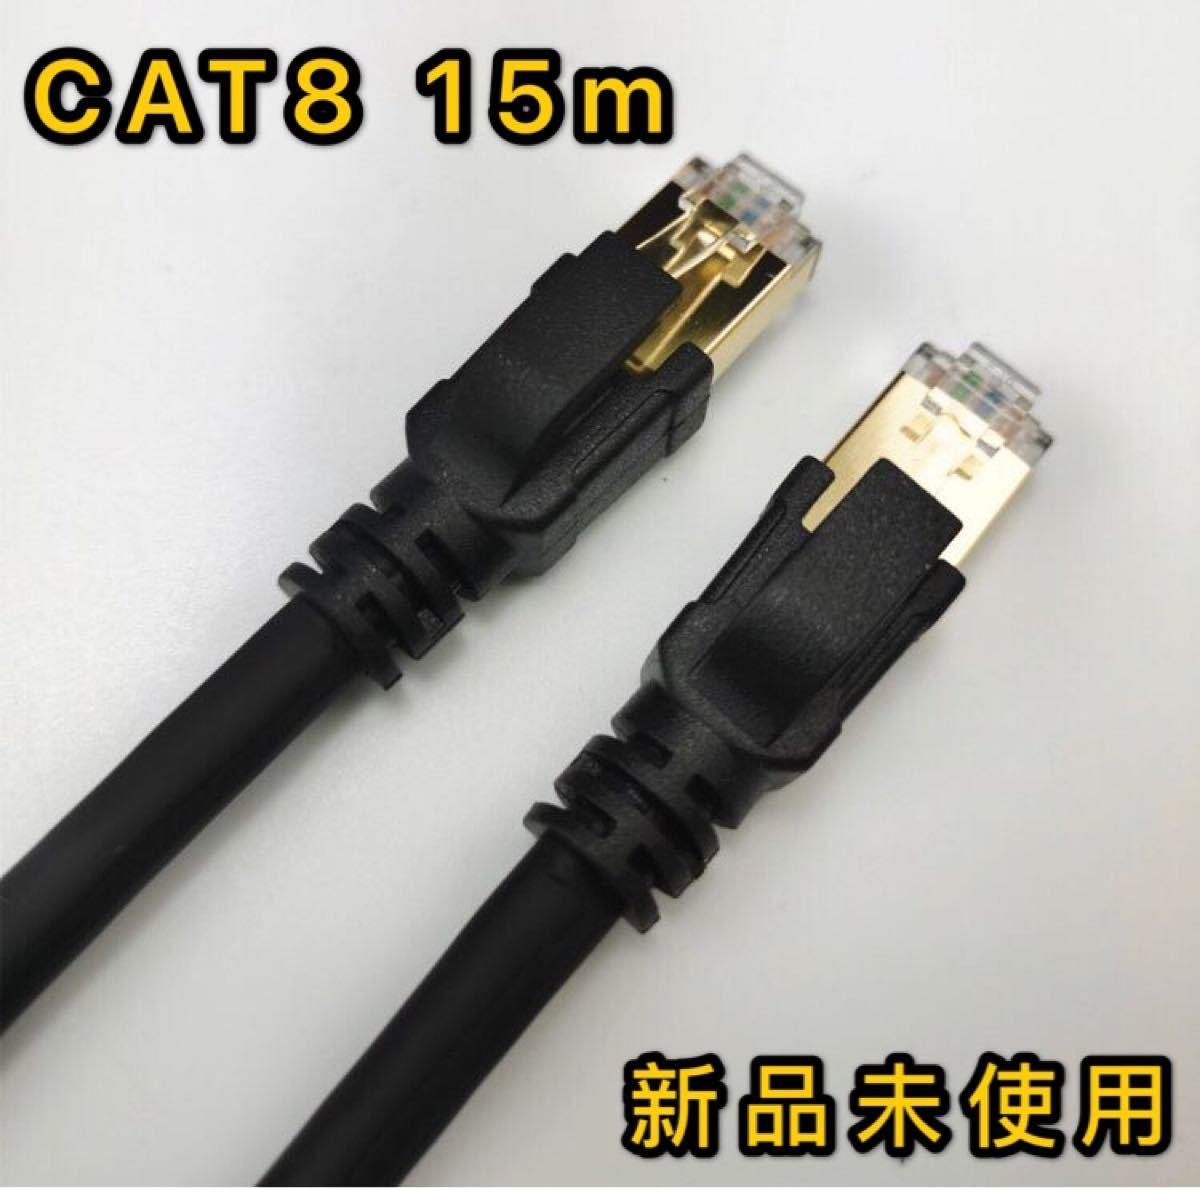 LANケーブル 15m CAT8 40ギガビット 超高速通信対応新品未使用光回線